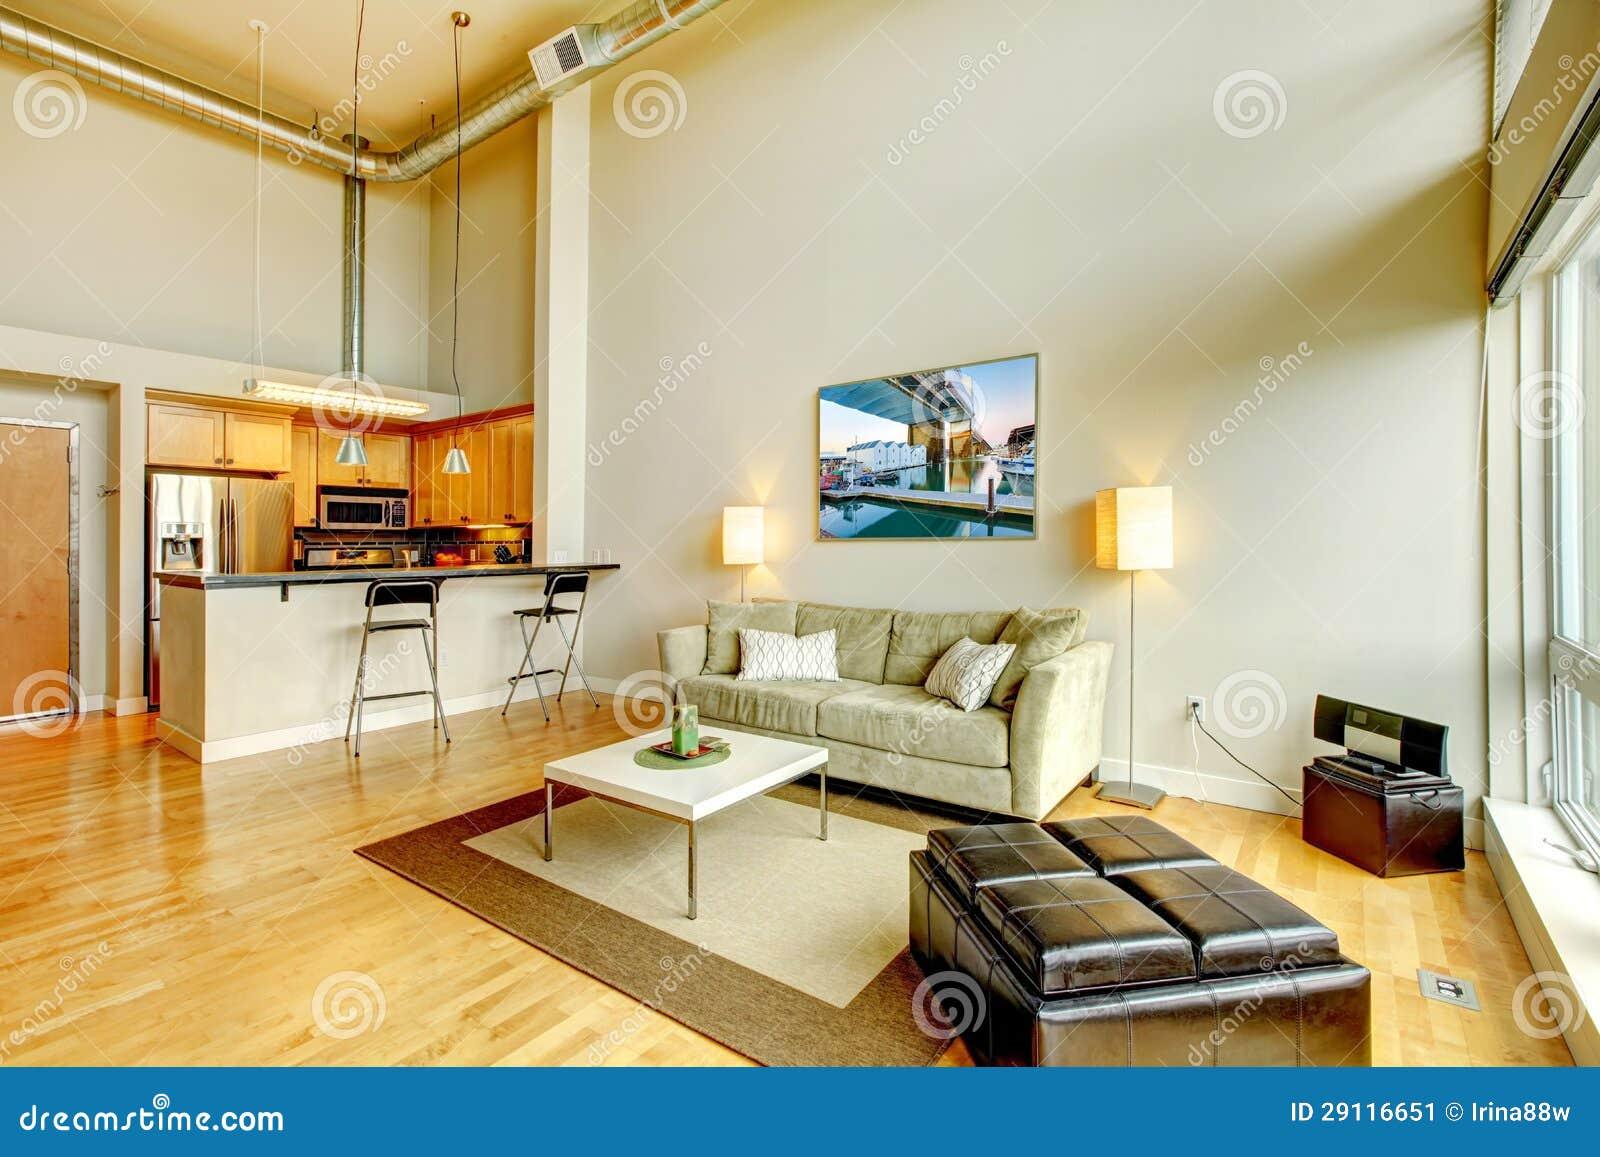 Modern Loft Apartment Living Room Interior With Kitchen